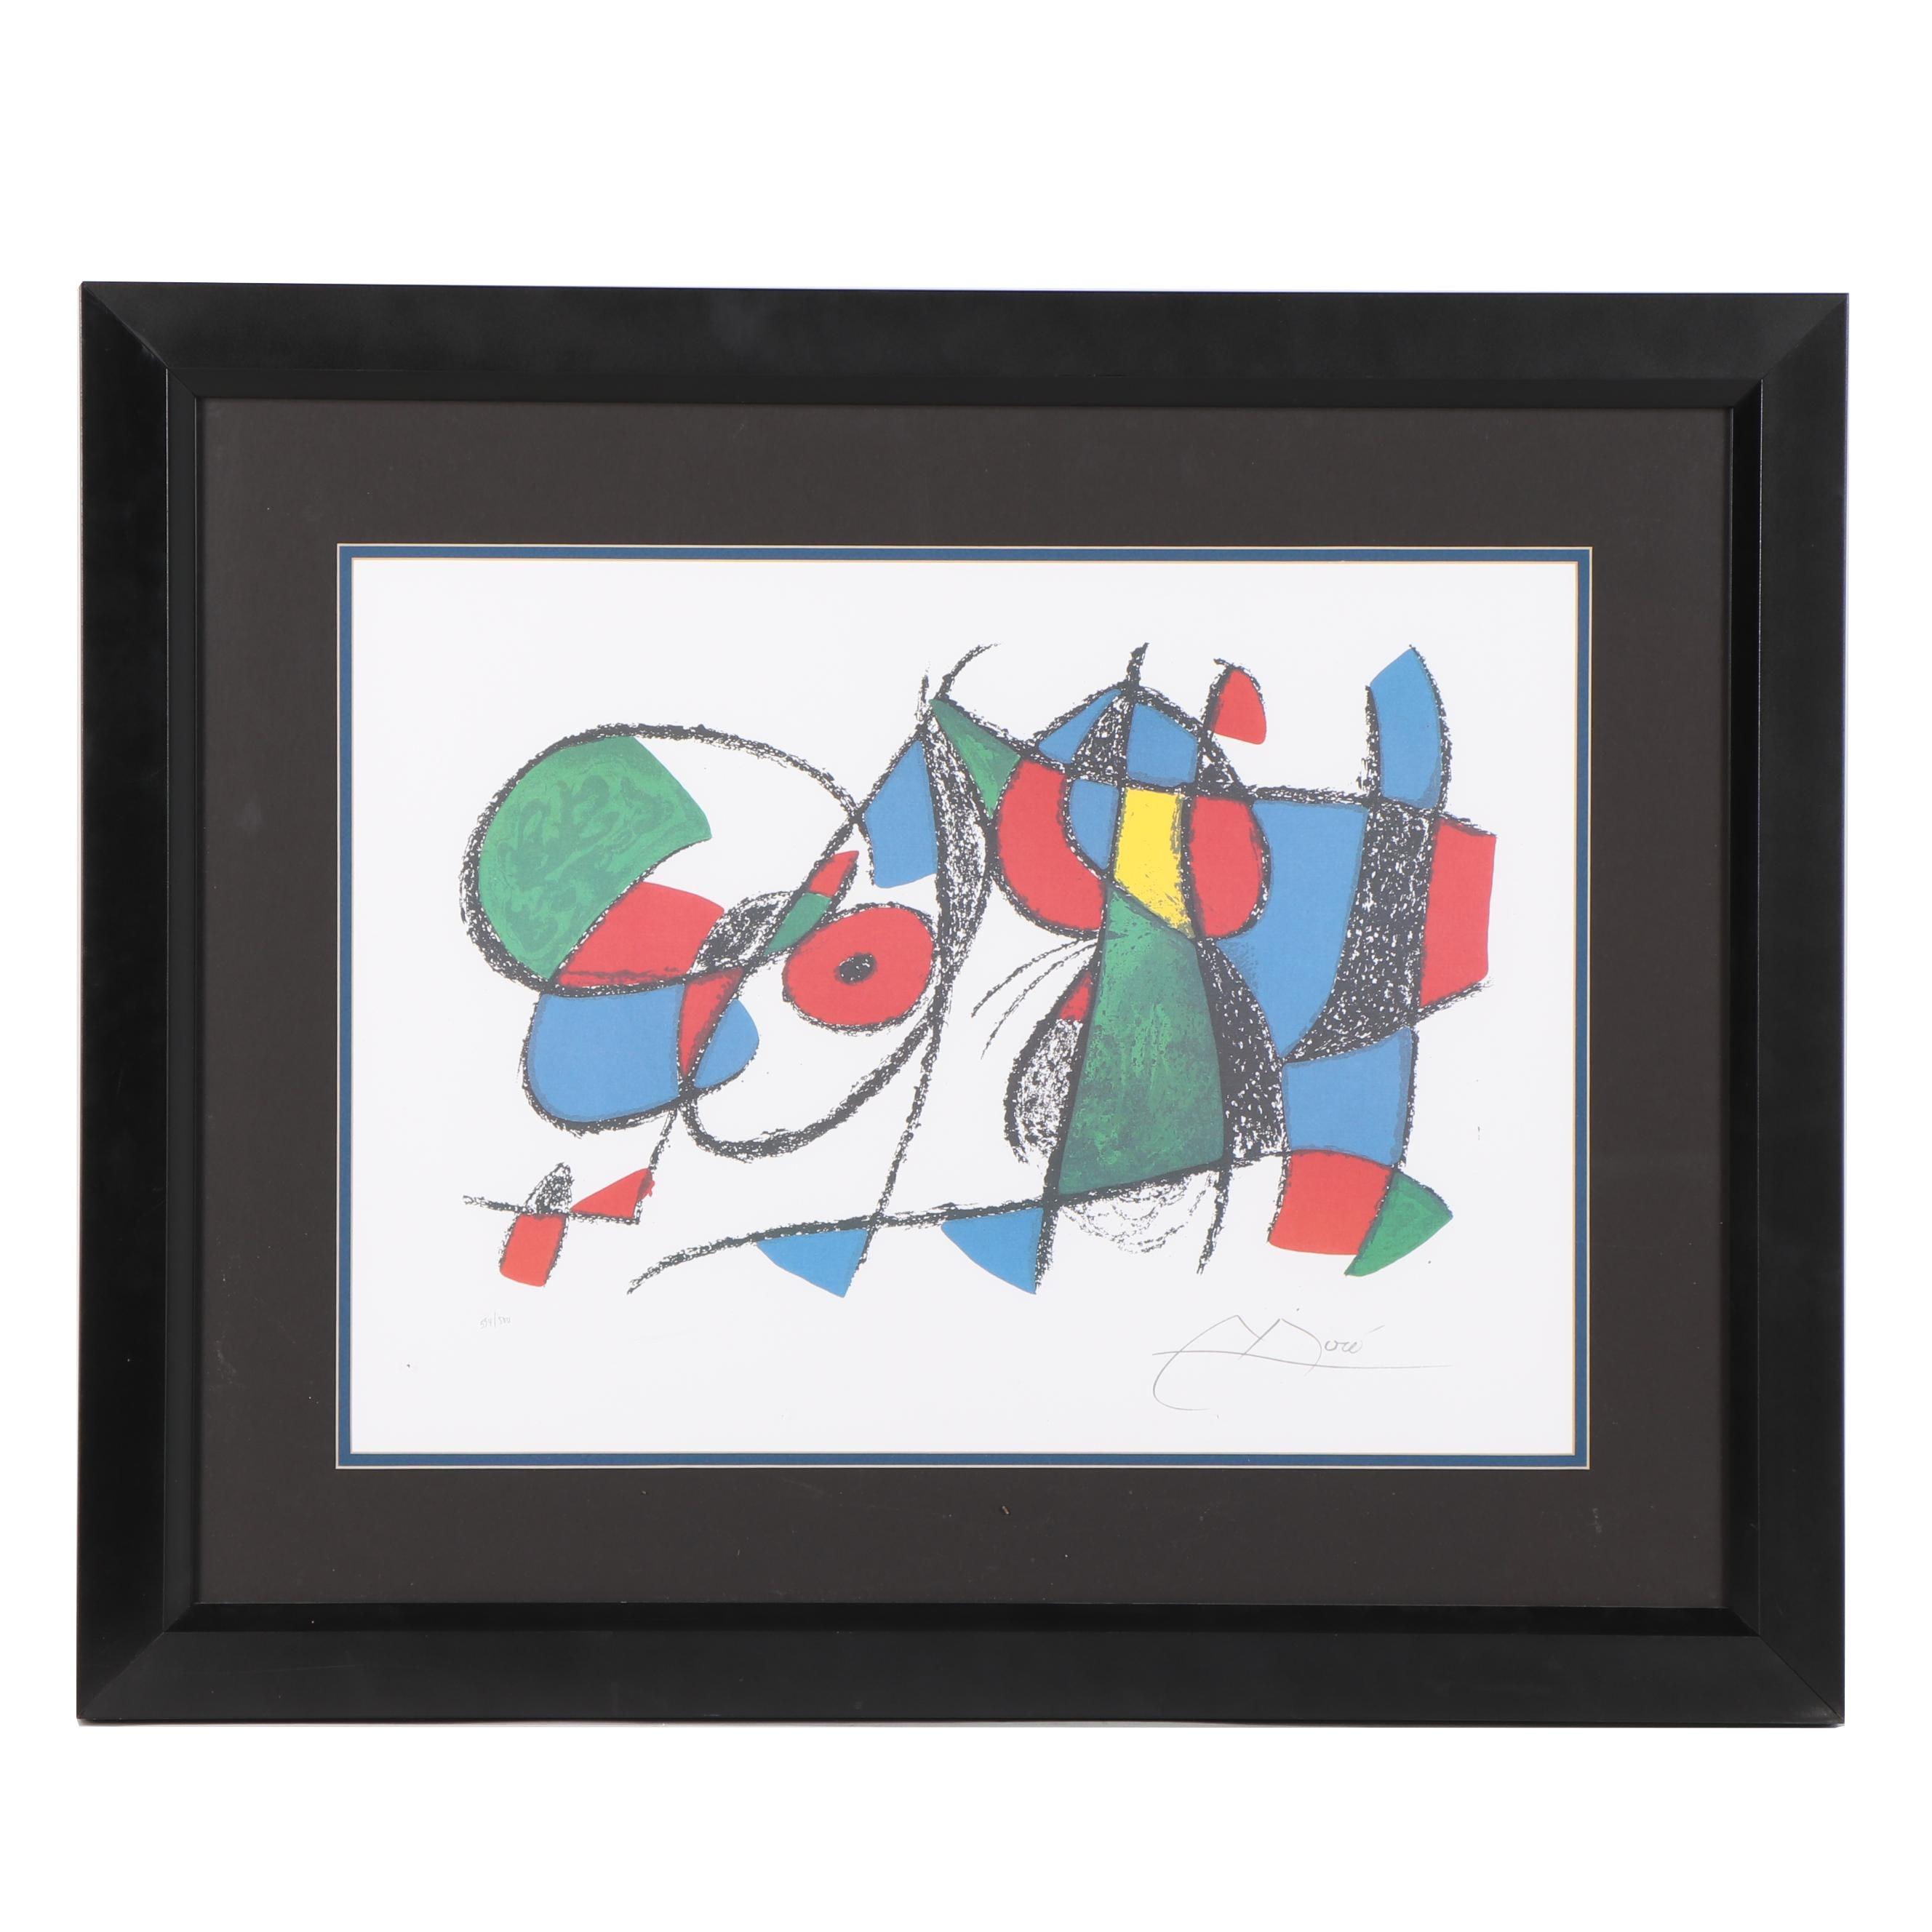 Color Lithograph after Joan Miró